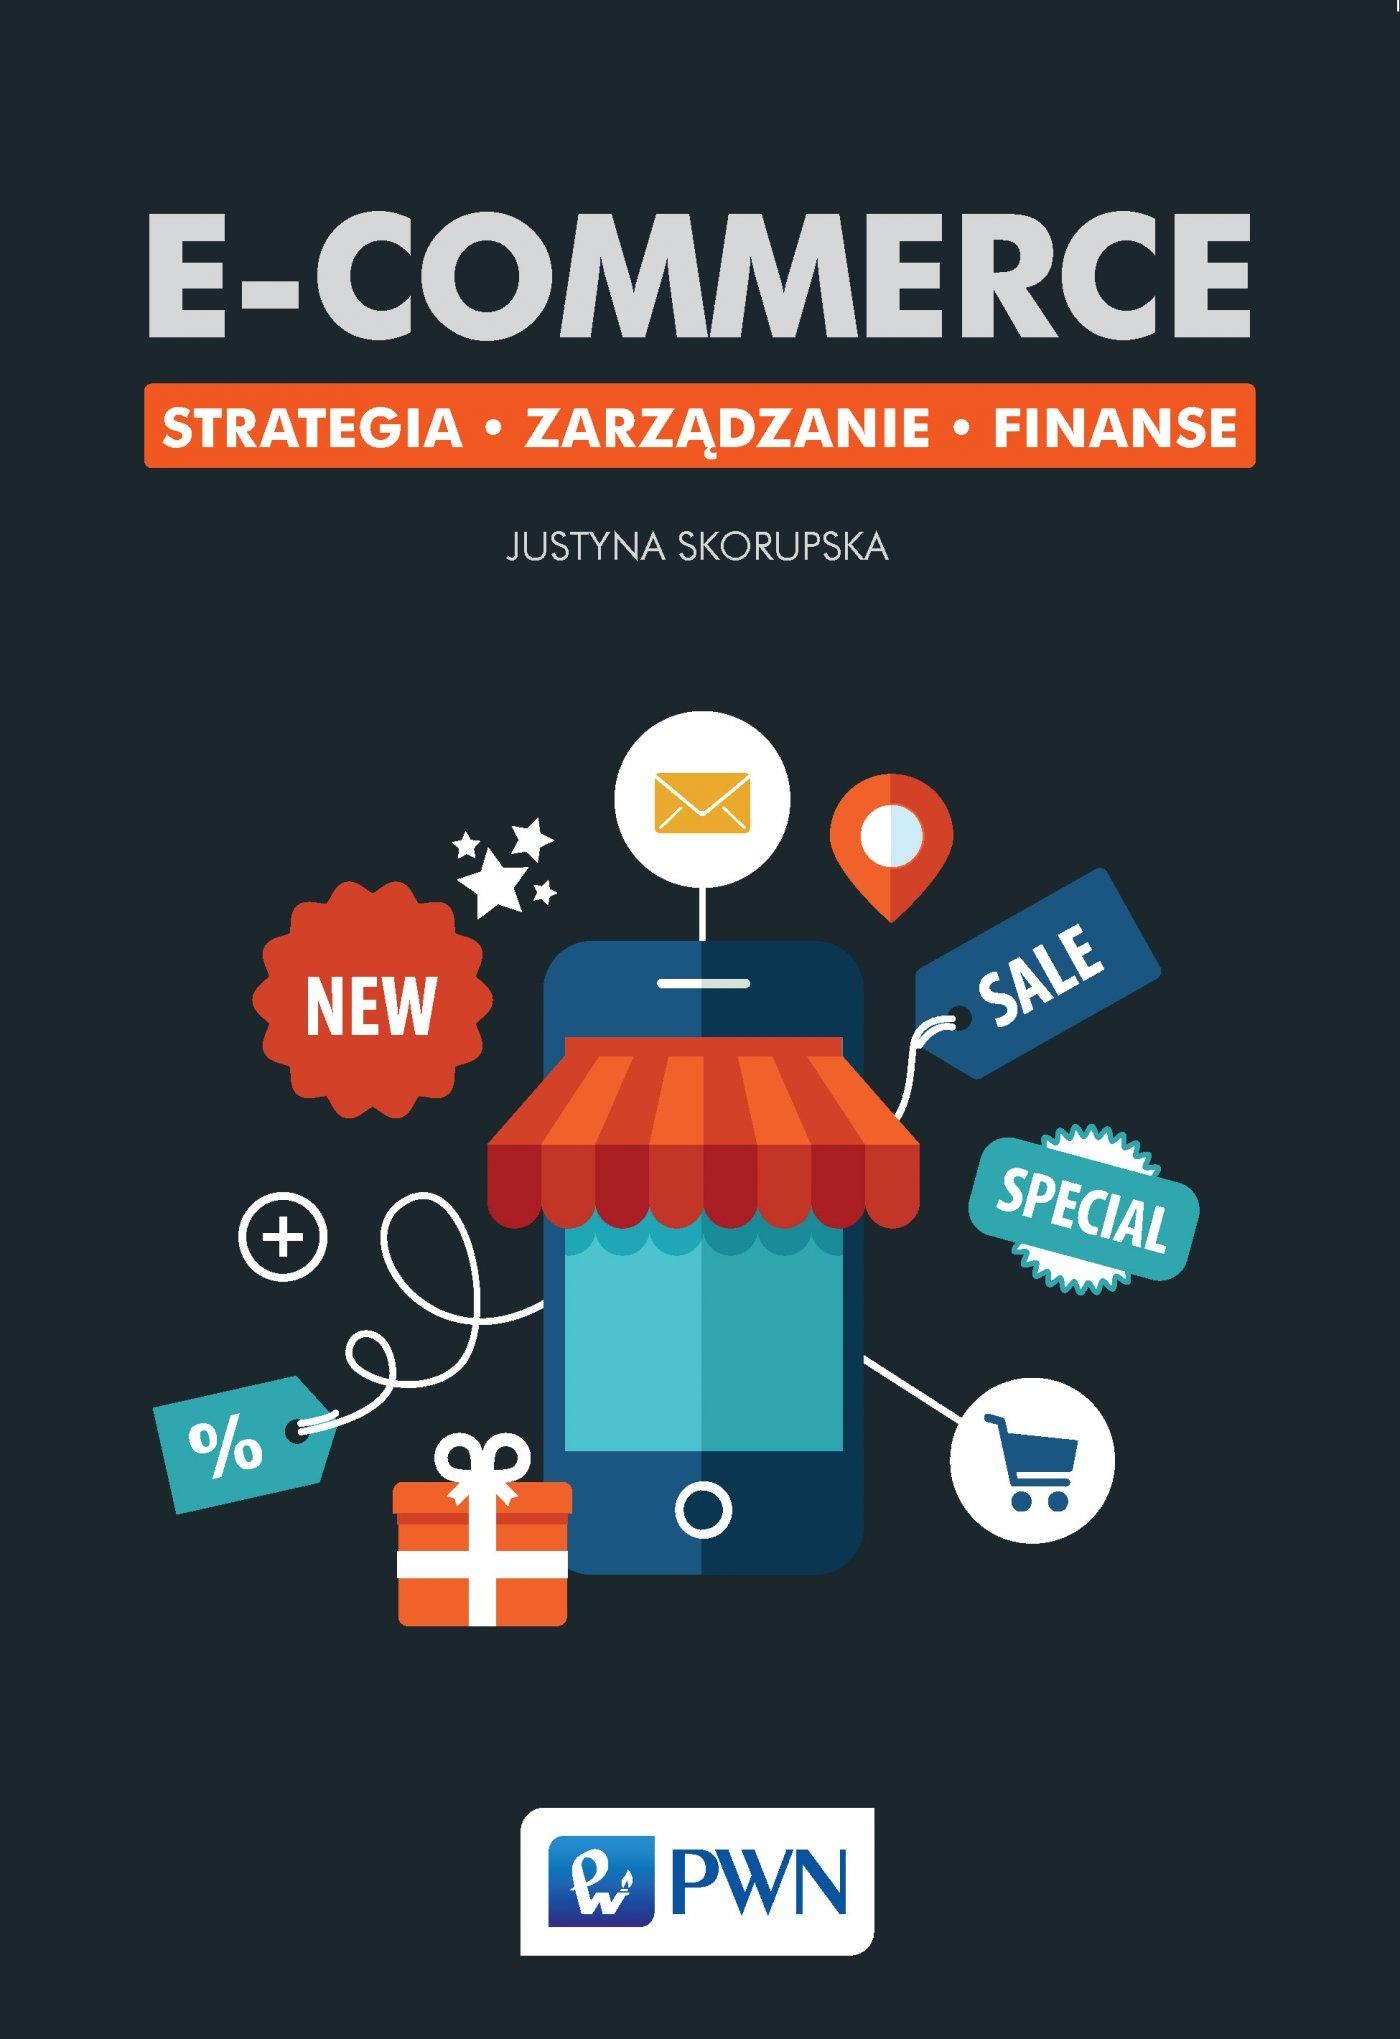 E-commerce. Strategia. Justyna Skorupska